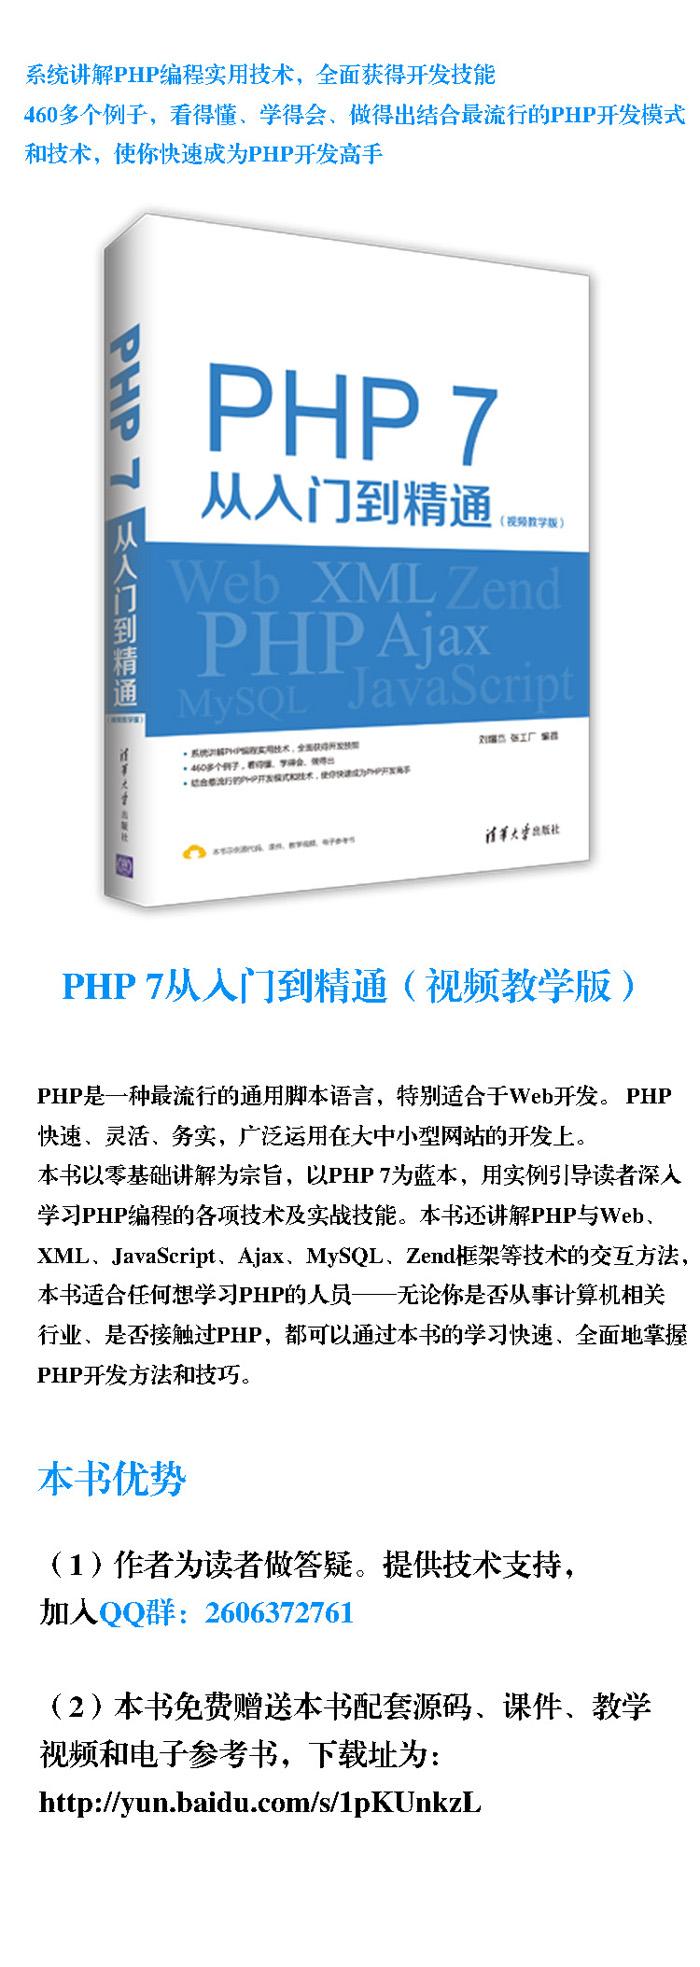 PHP7从调教到精通(视频教学版)警察入门成母狗奴被迫图片